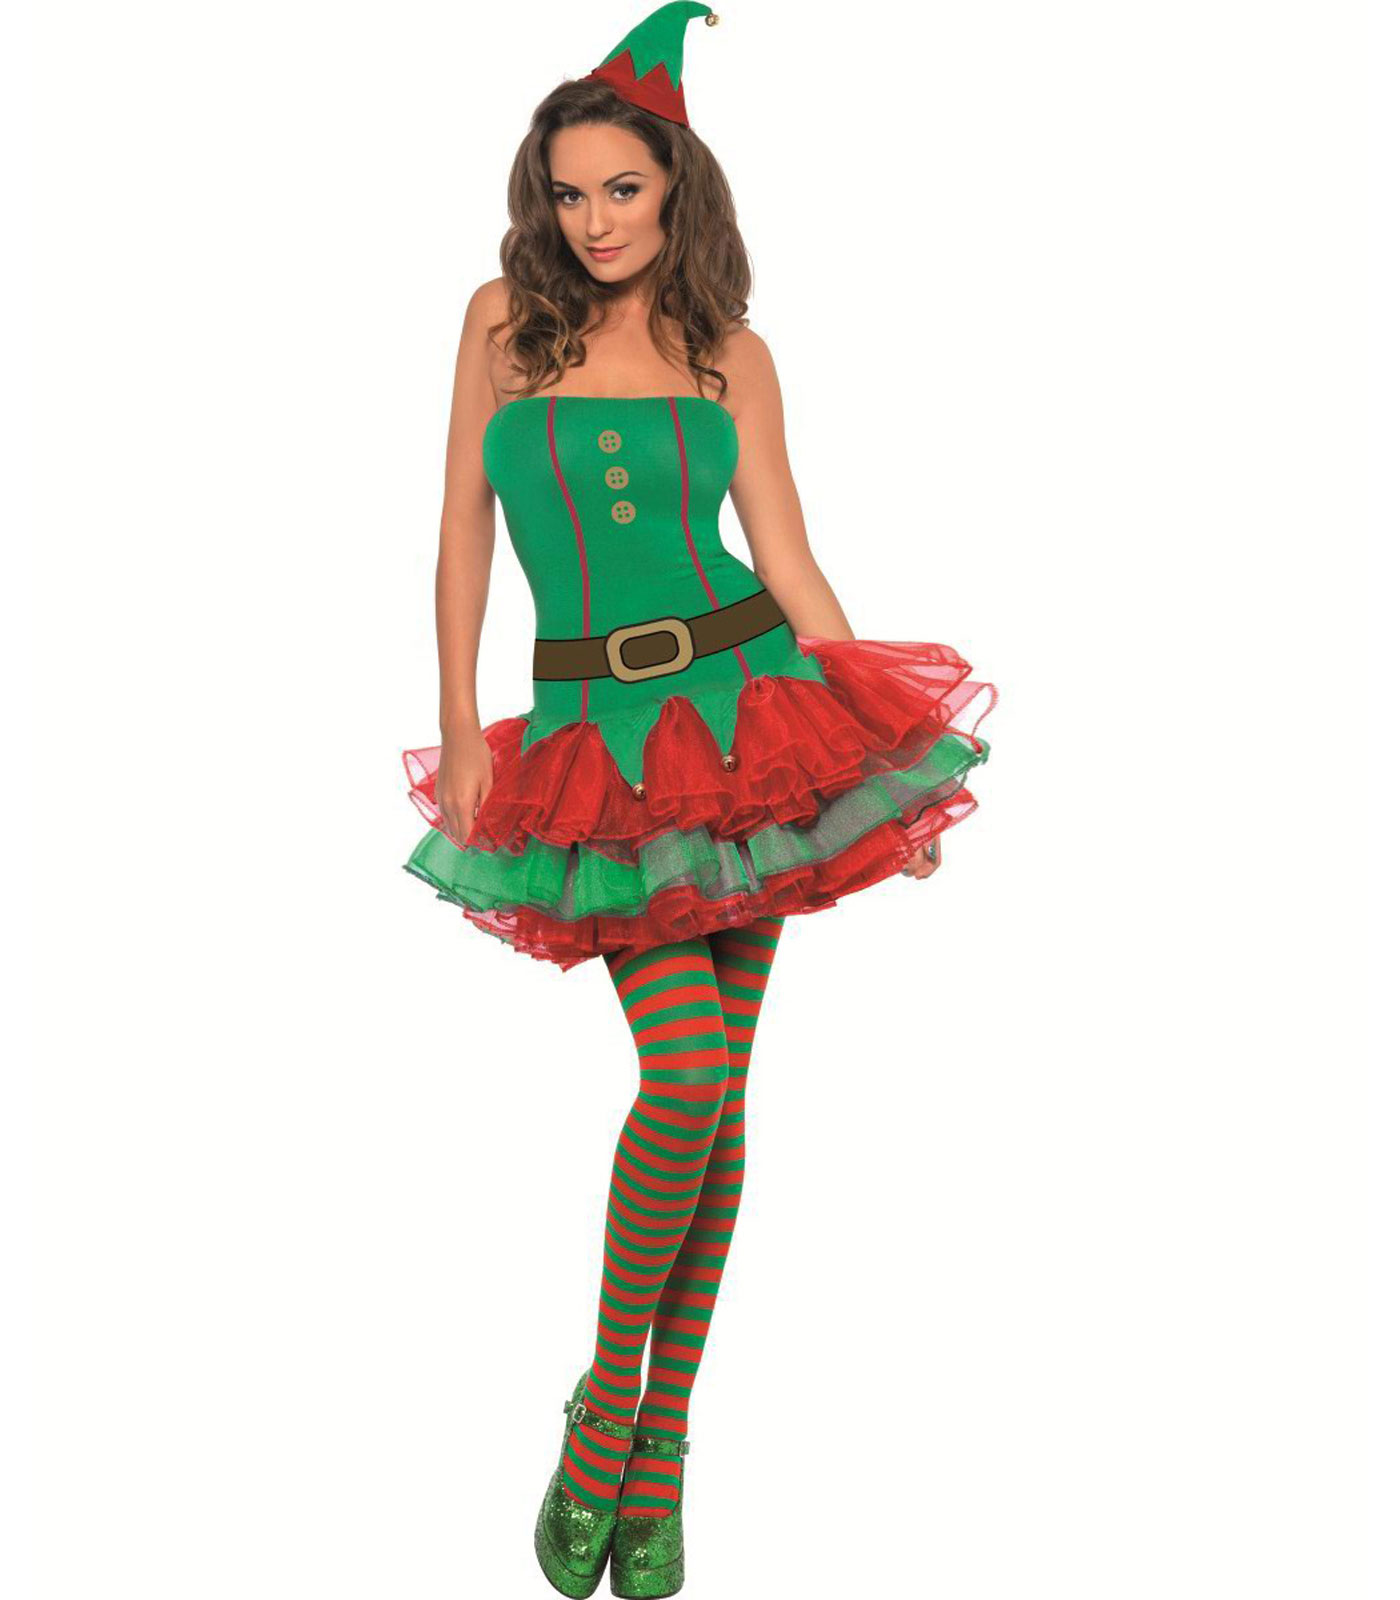 6c517838b8592 Déguisement elfe sexy femme   Deguise-toi